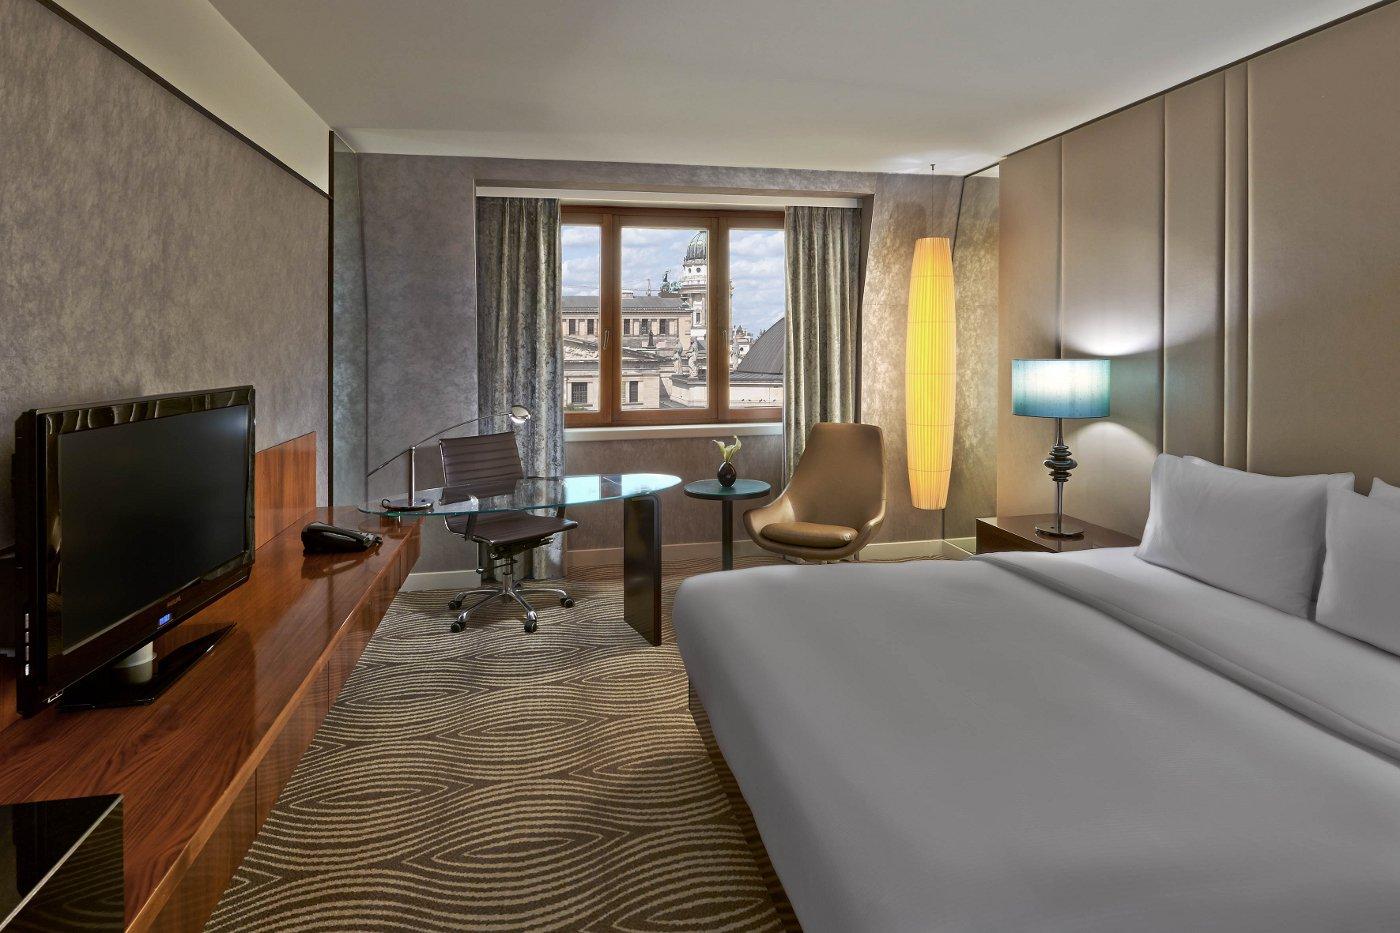 Freie Hotels Berlin Silvester